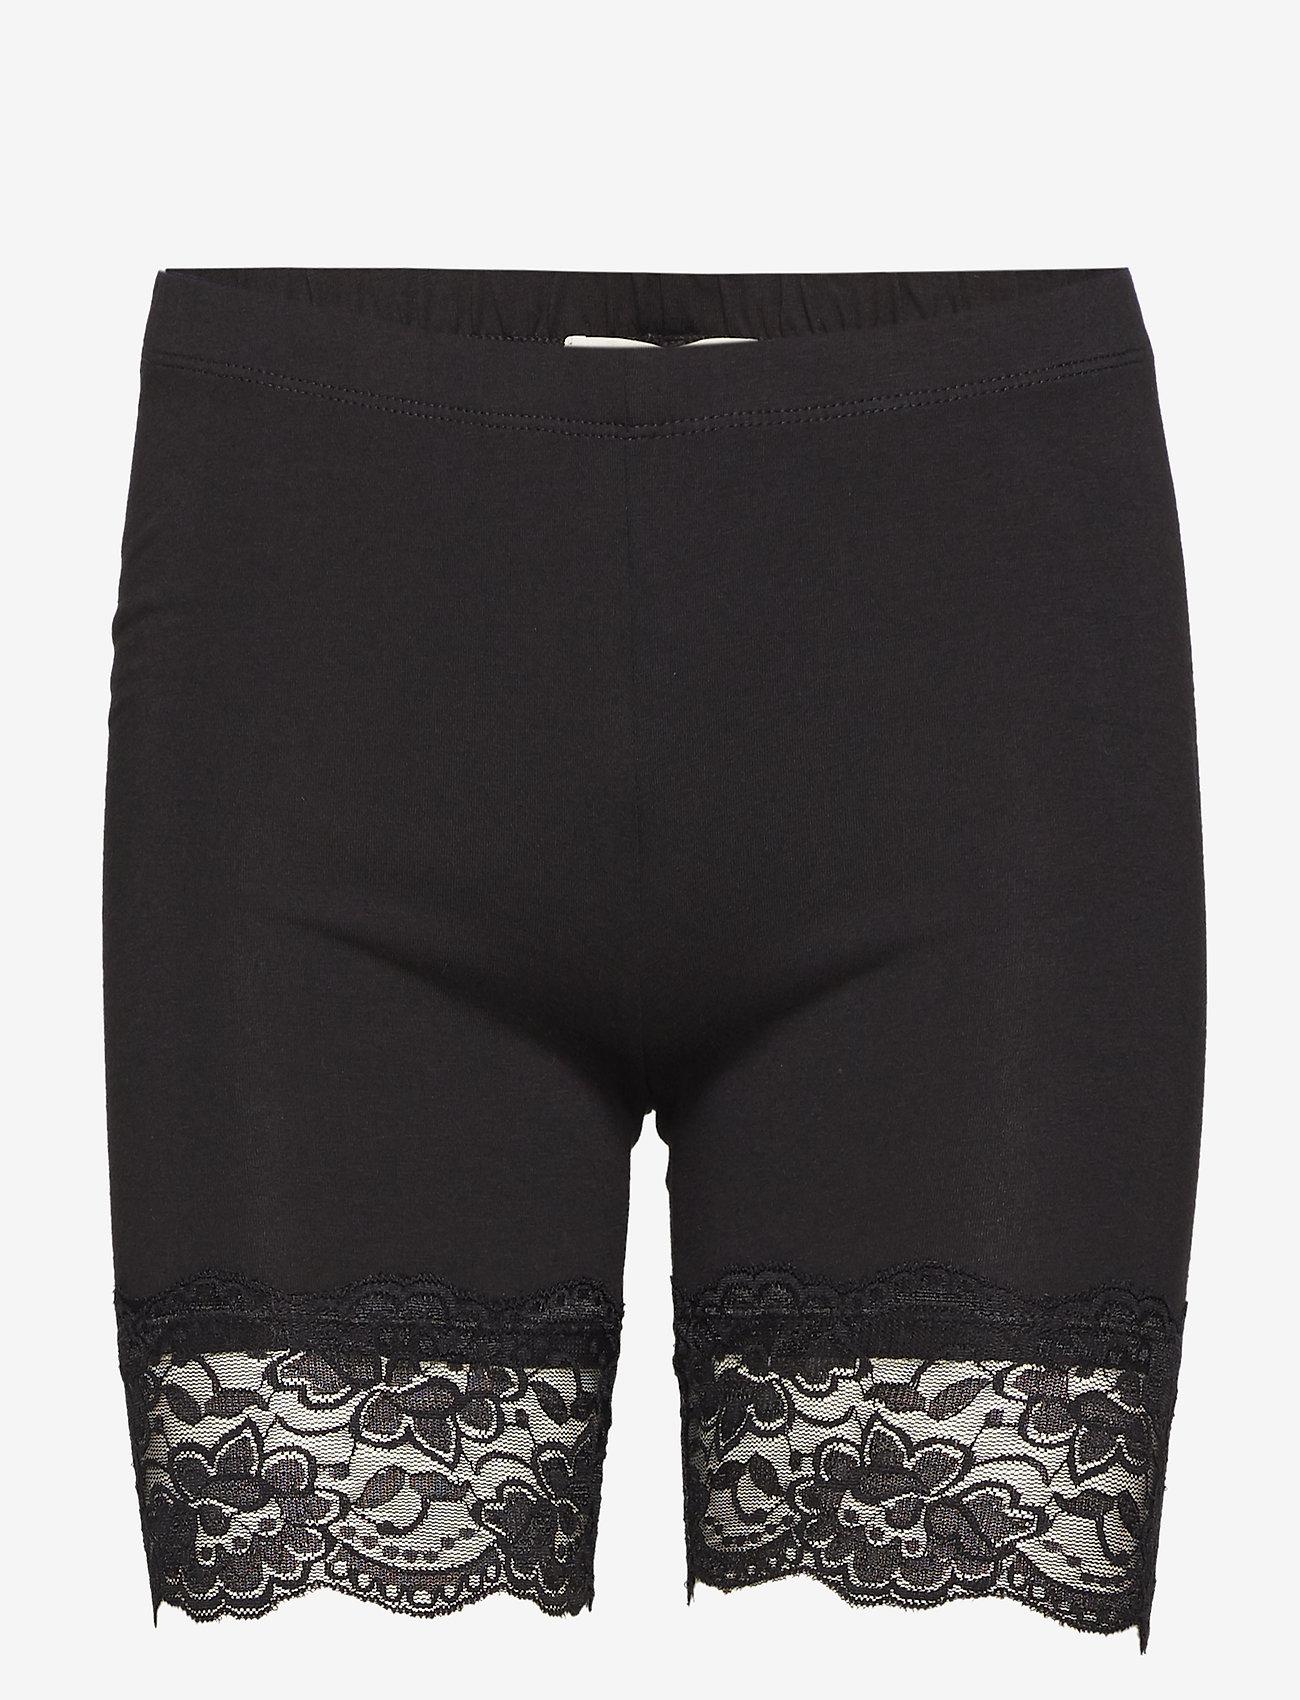 Cream - Matilda Biker Shorts - bottoms - pitch black - 1